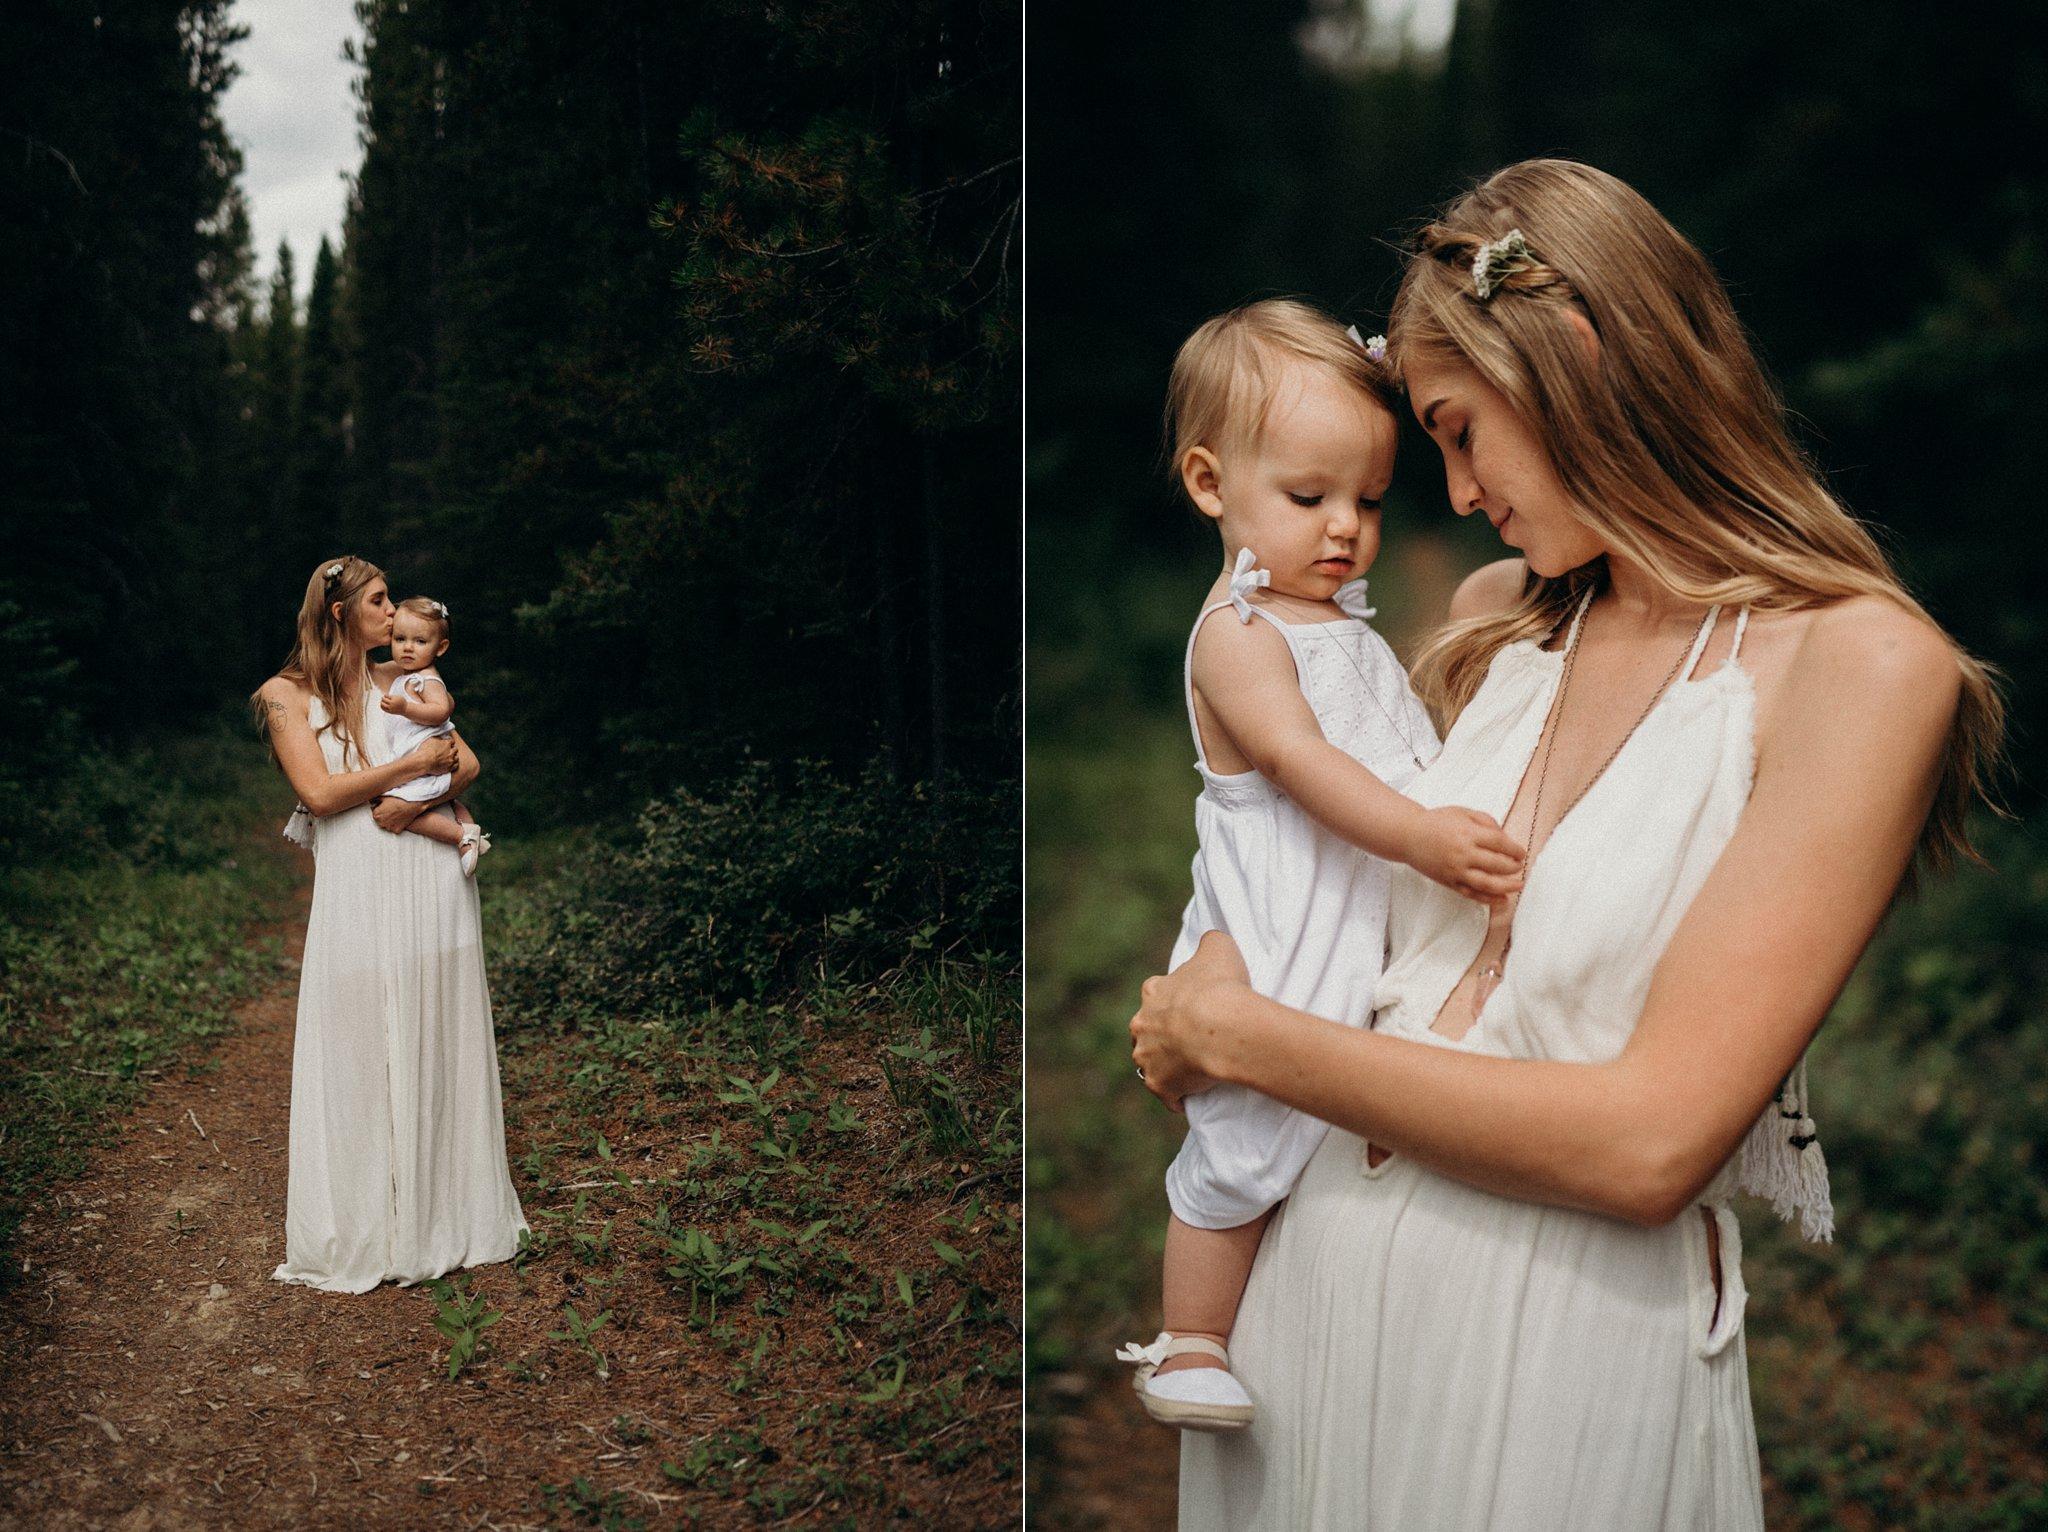 kaihla_tonai_intimate_wedding_elopement_photographer_6370.jpg